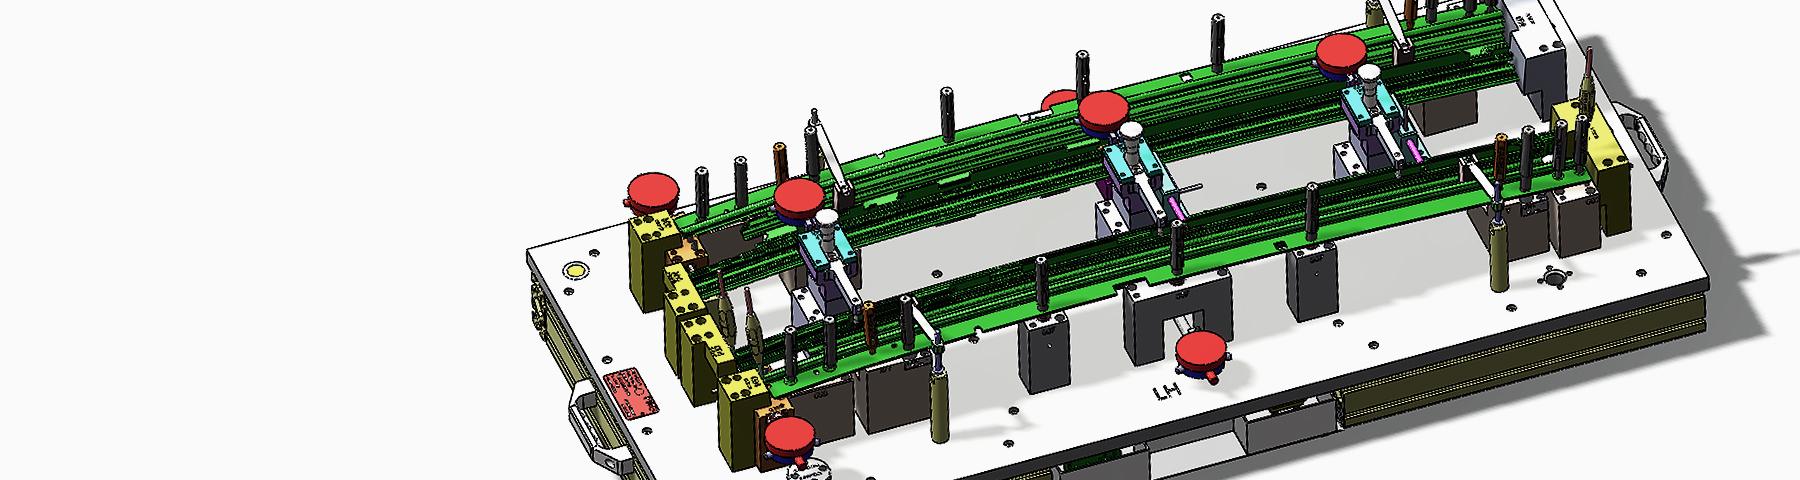 innocept engineering pr flehre aluminium stanzbiegeprofil. Black Bedroom Furniture Sets. Home Design Ideas